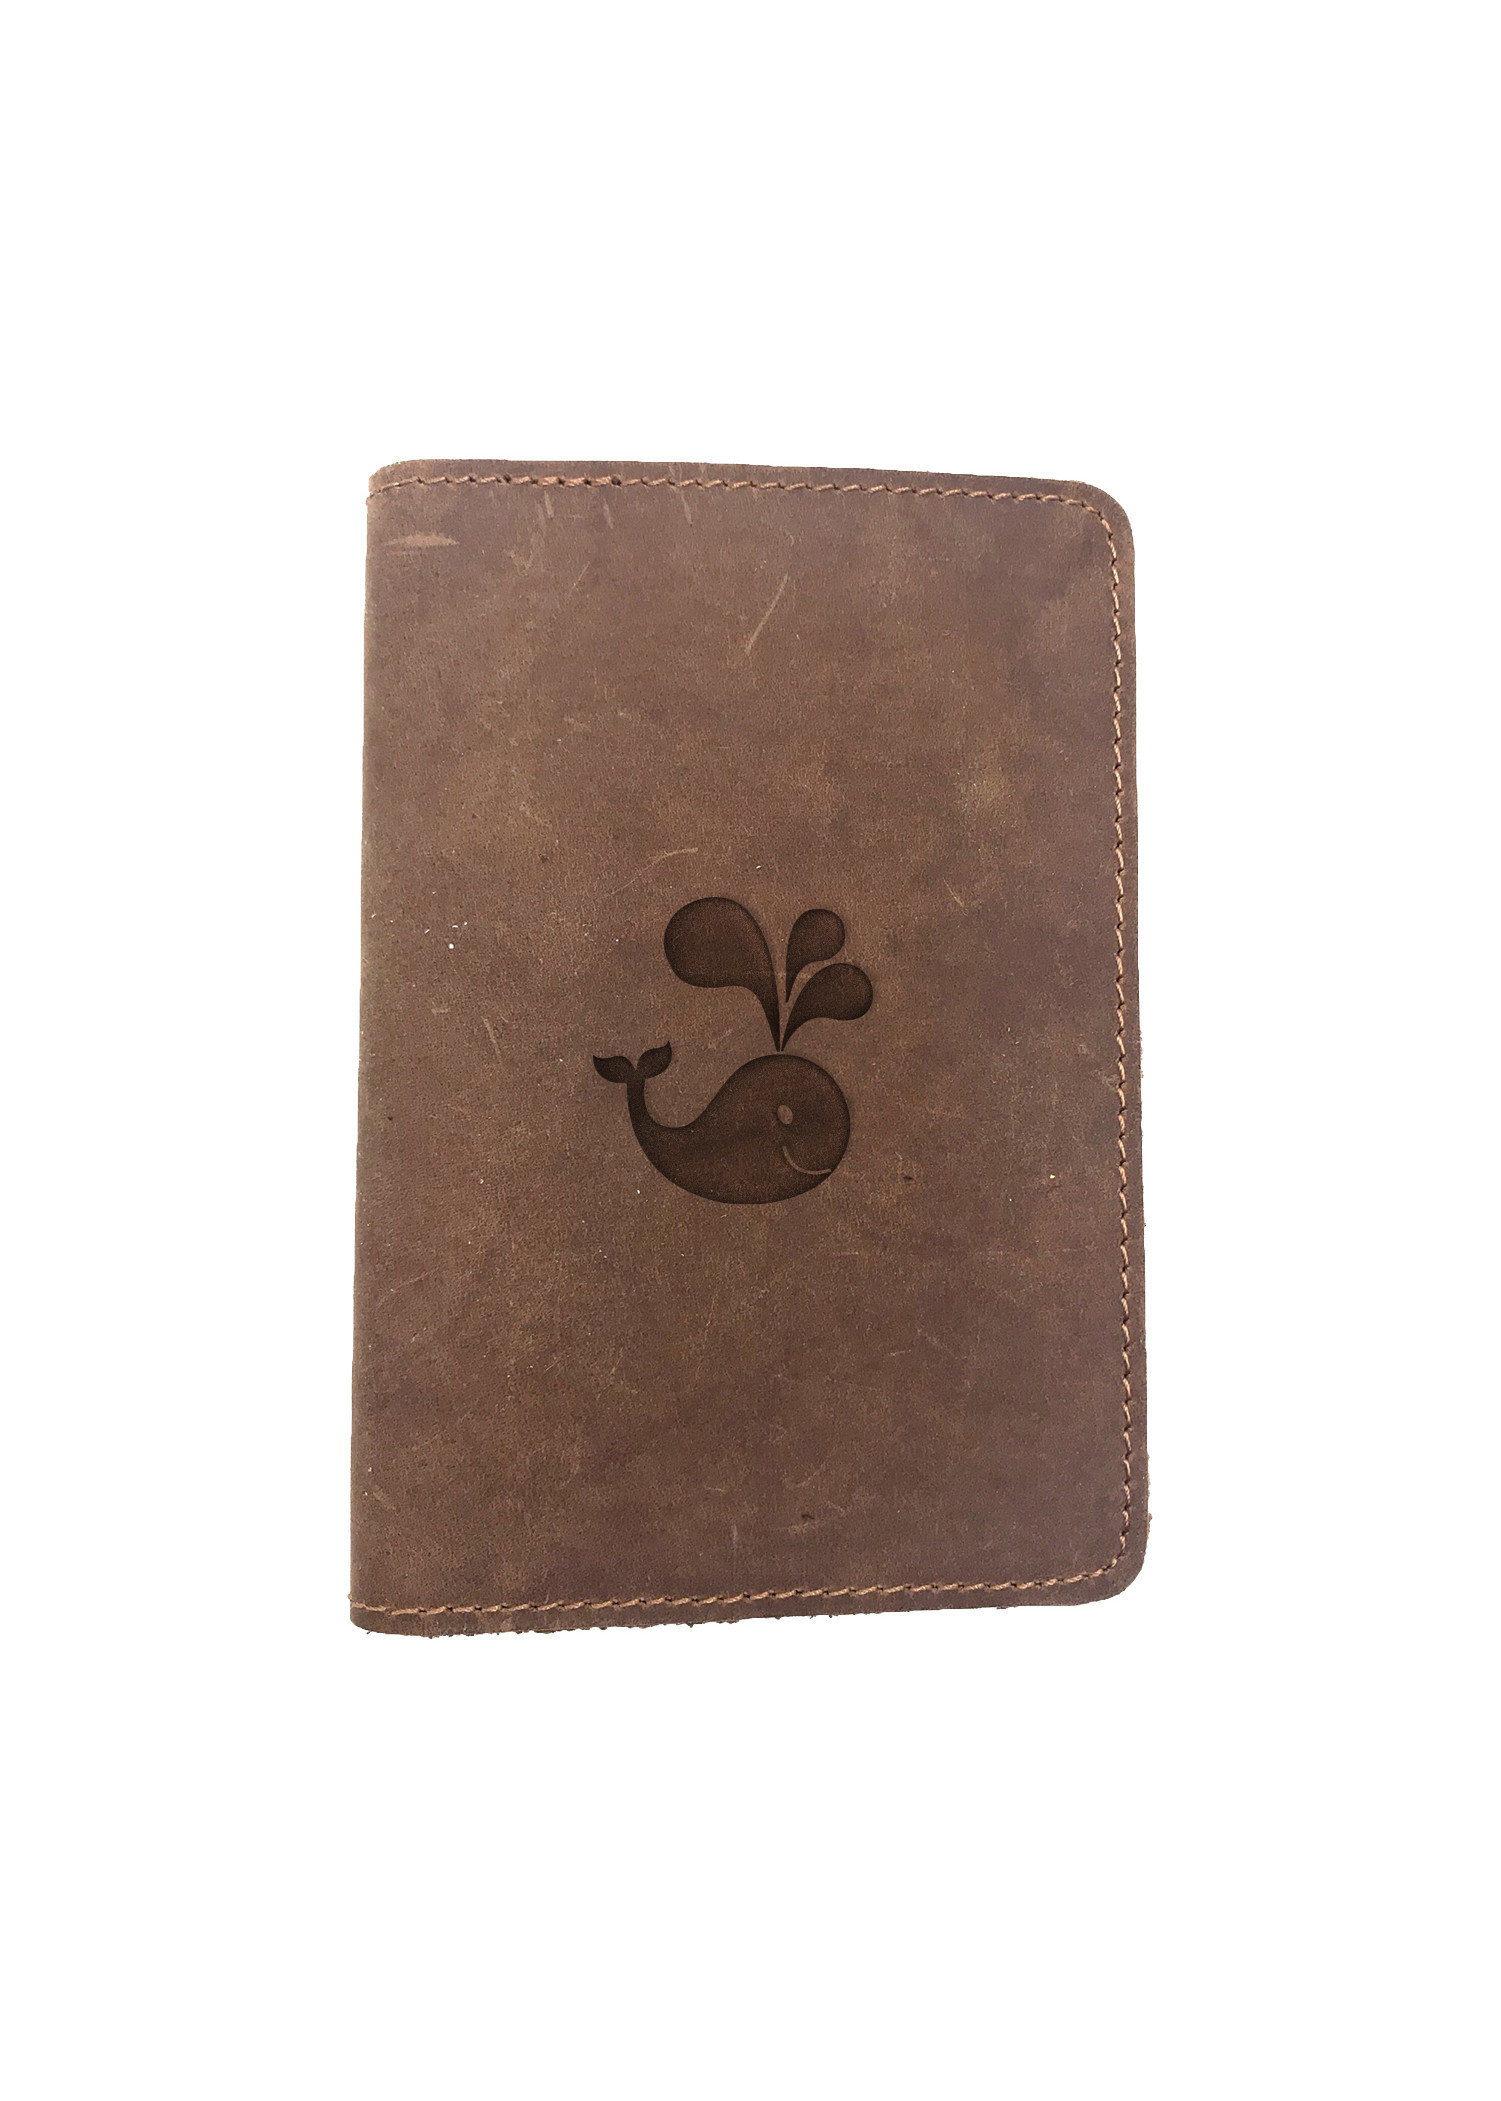 Passport Cover Bao Da Hộ Chiếu Da Sáp Khắc Hình Cá voi HAPPY WHALE (BROWN)